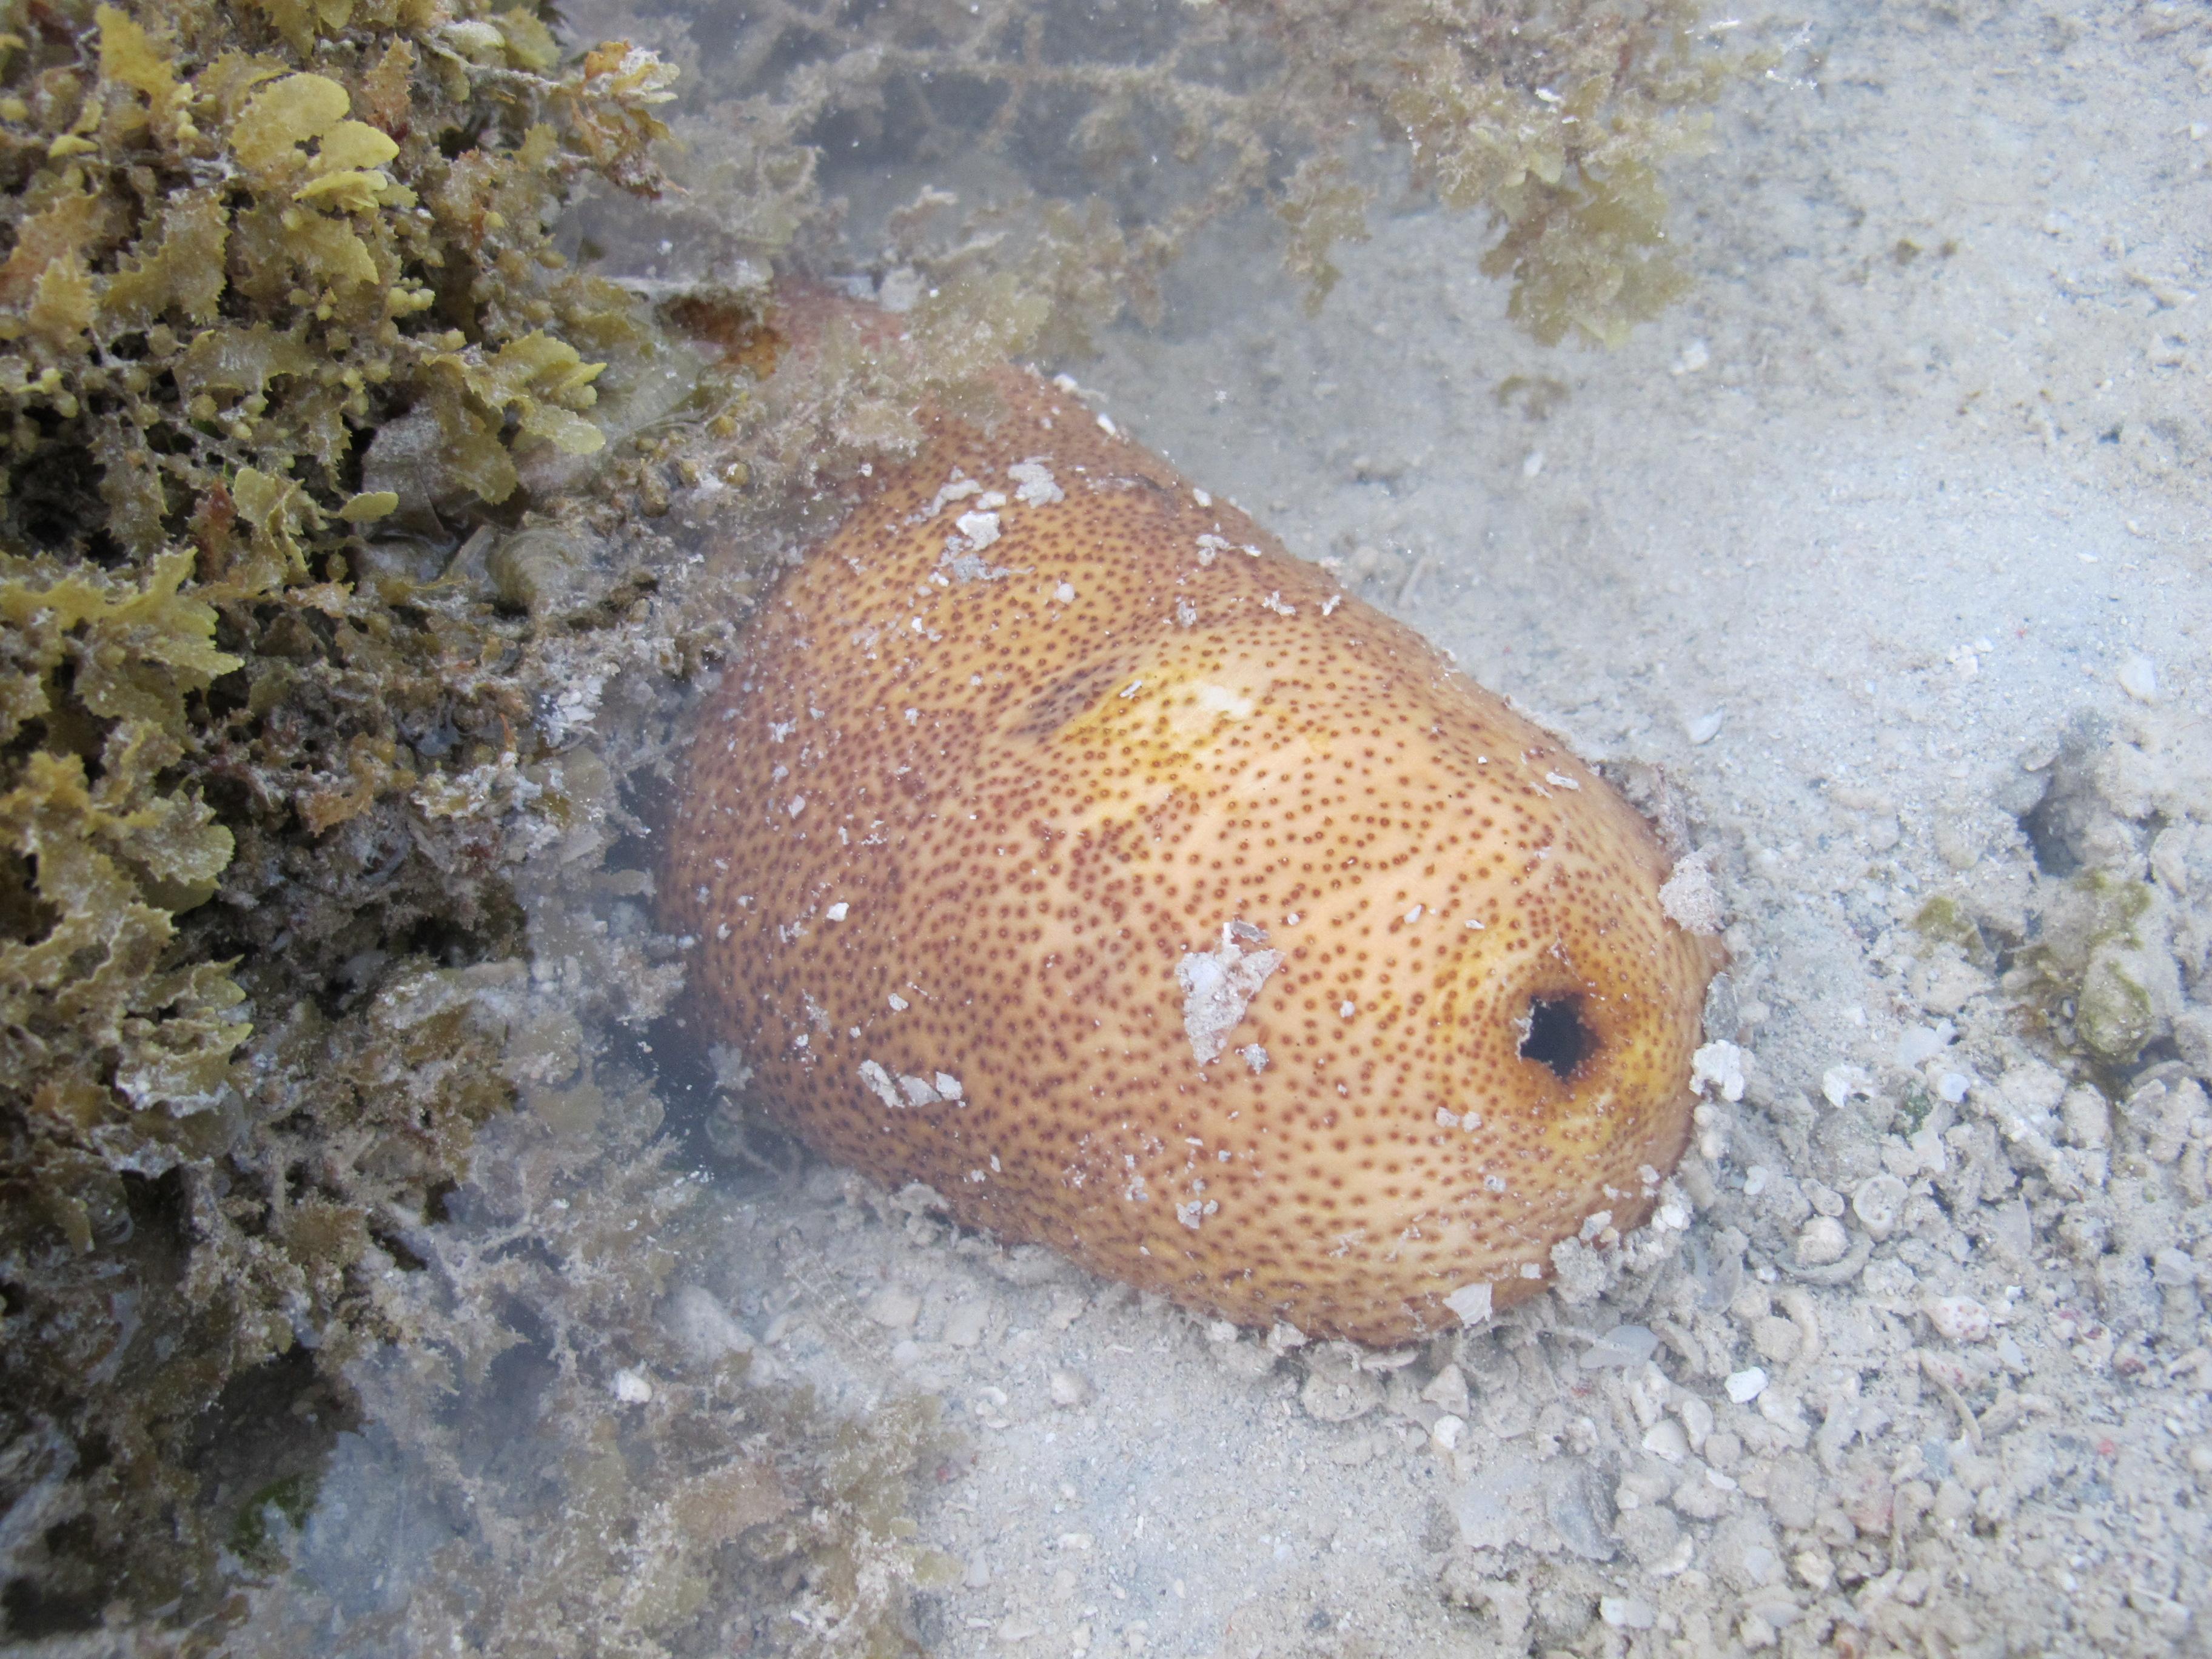 Защищающийся Морской огурец, Defensive sea cucumber, Bohadschia vitiensis